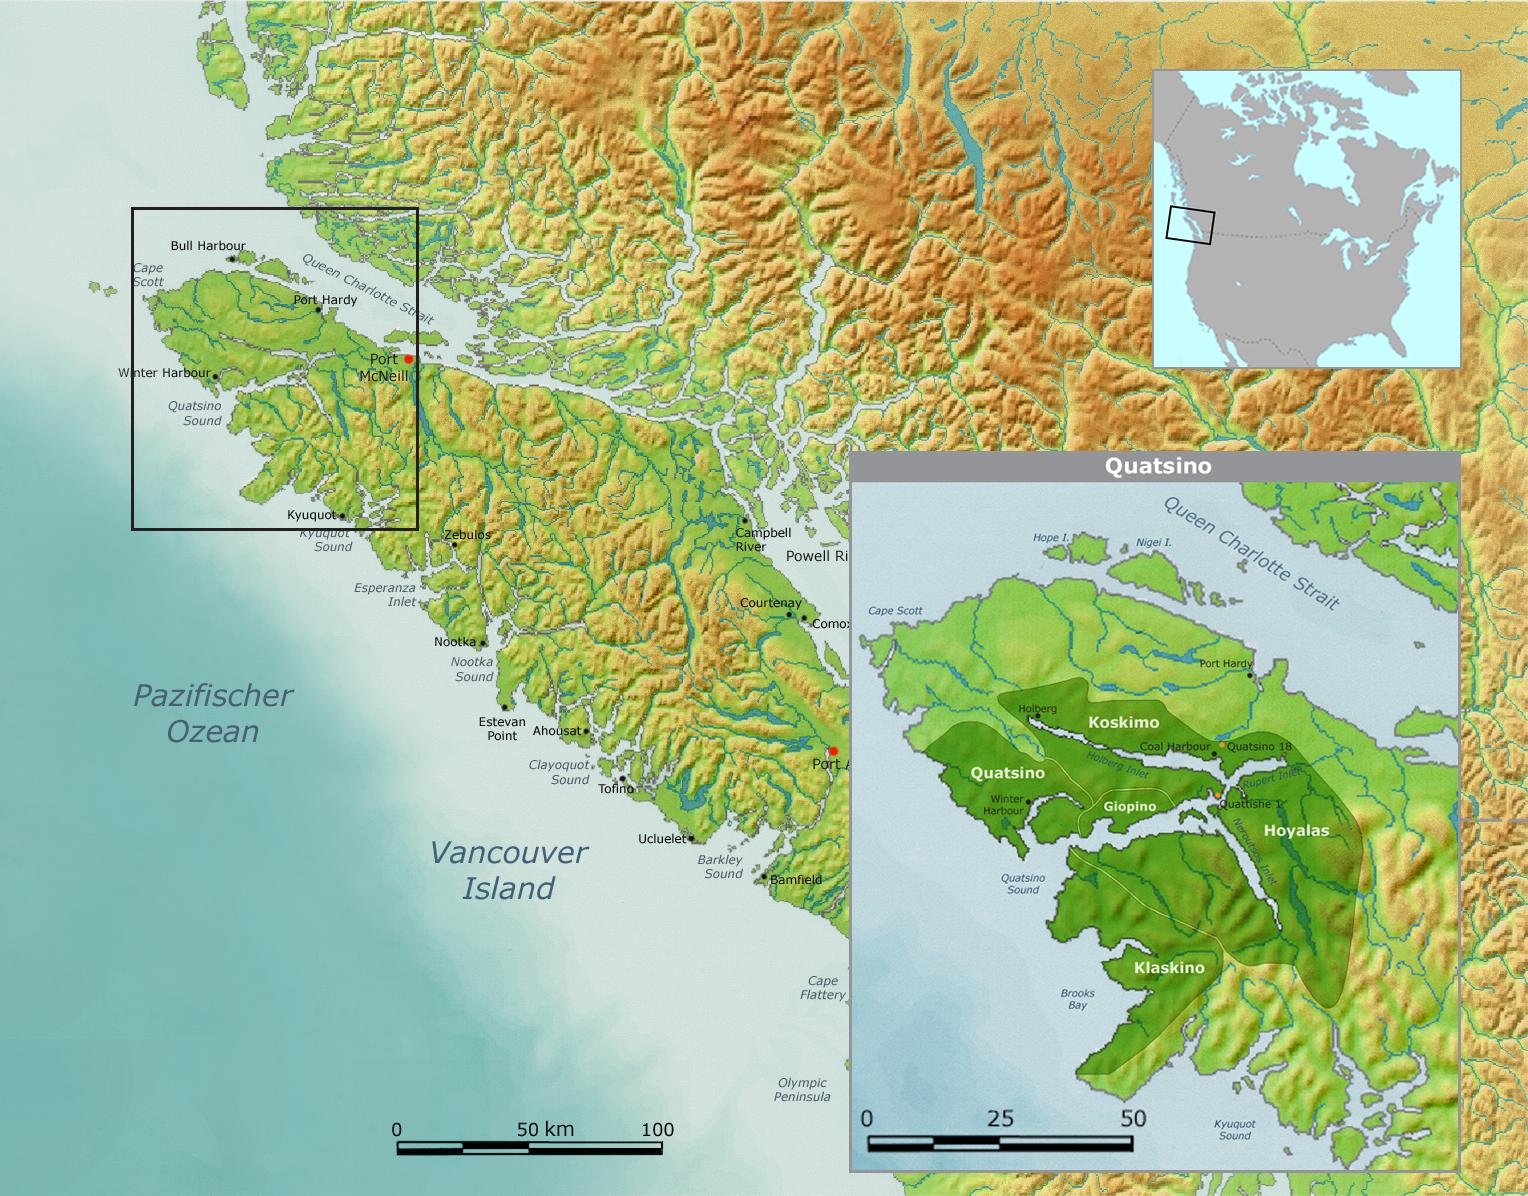 Quatsino Territory Vancouver Island